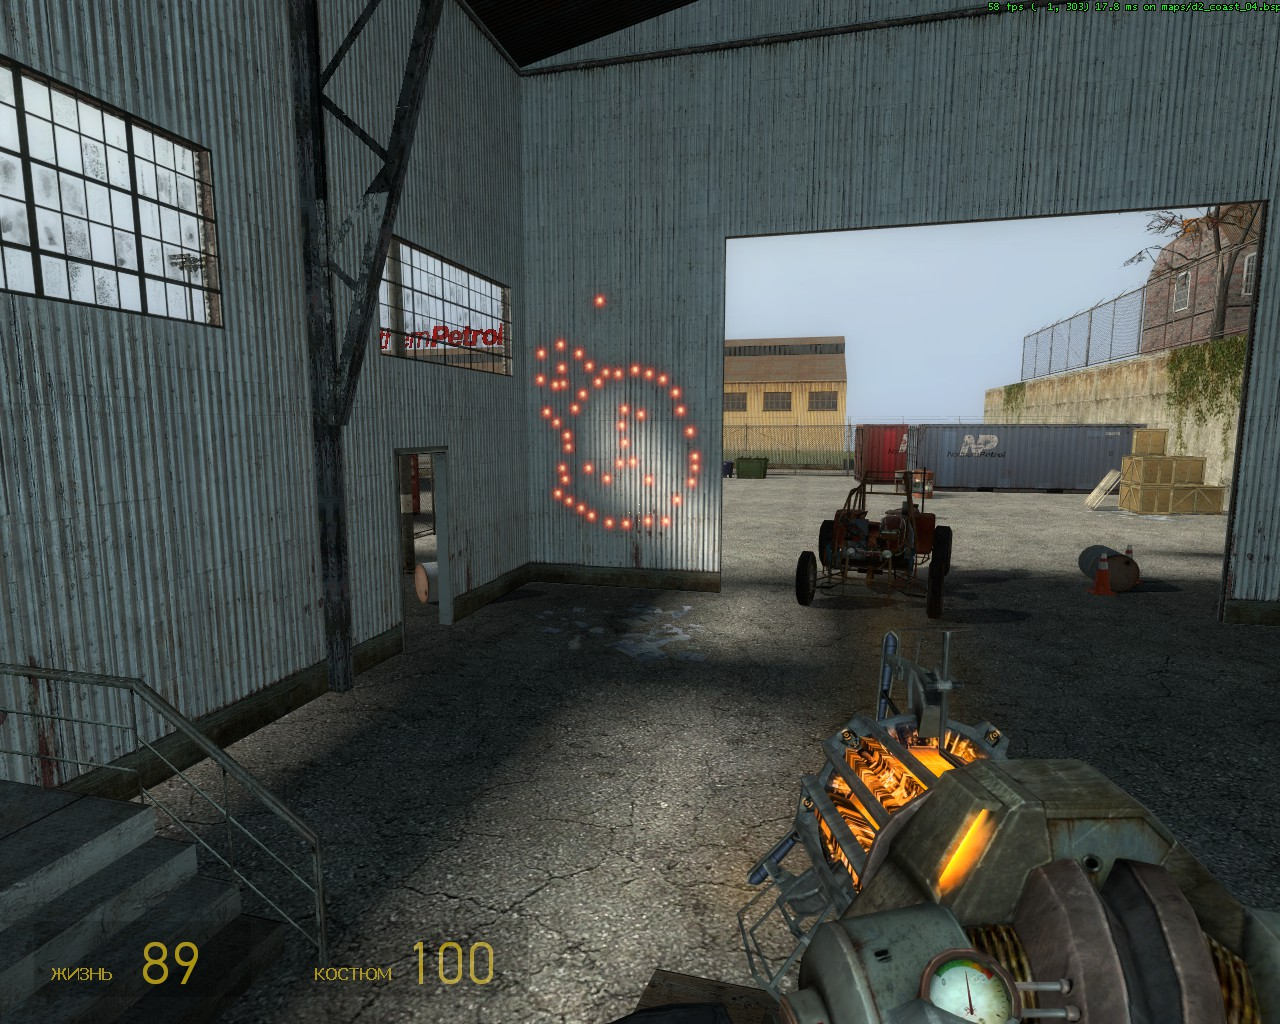 d2_coast_040019.jpg - Half-Life 2